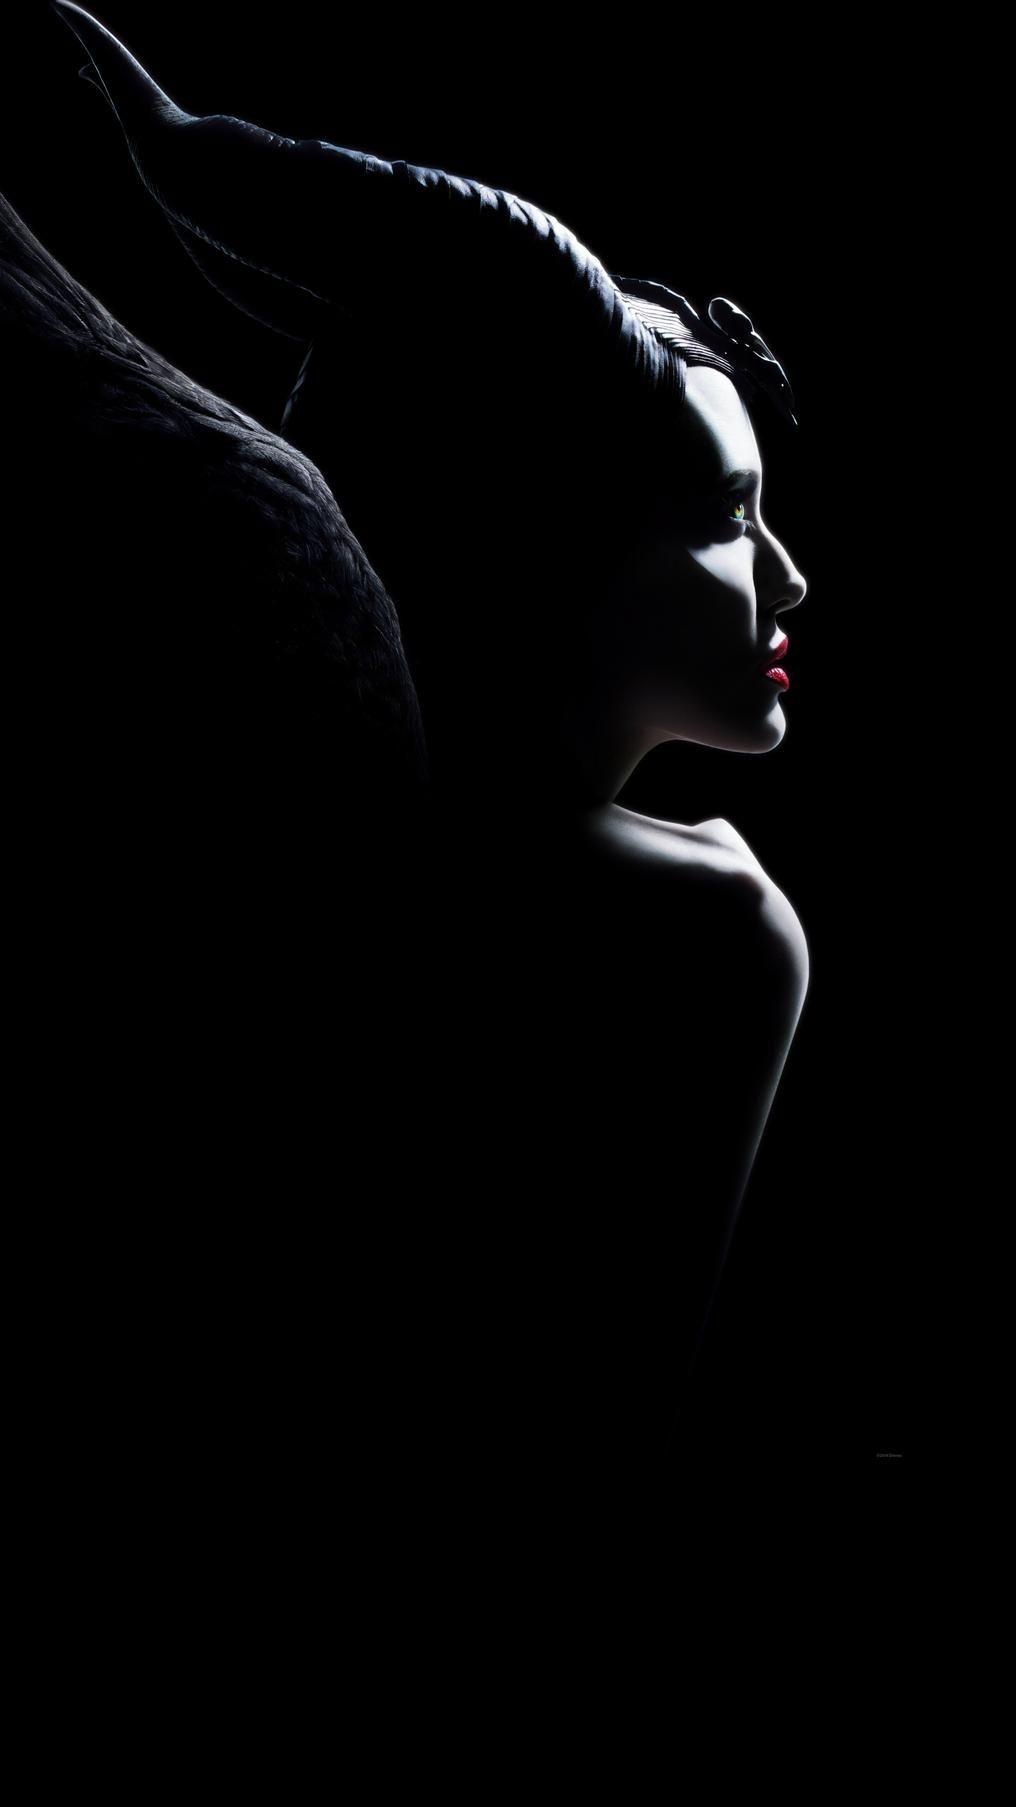 Wallpaper For Maleficent Mistress Of Evil 2019 Fondos De